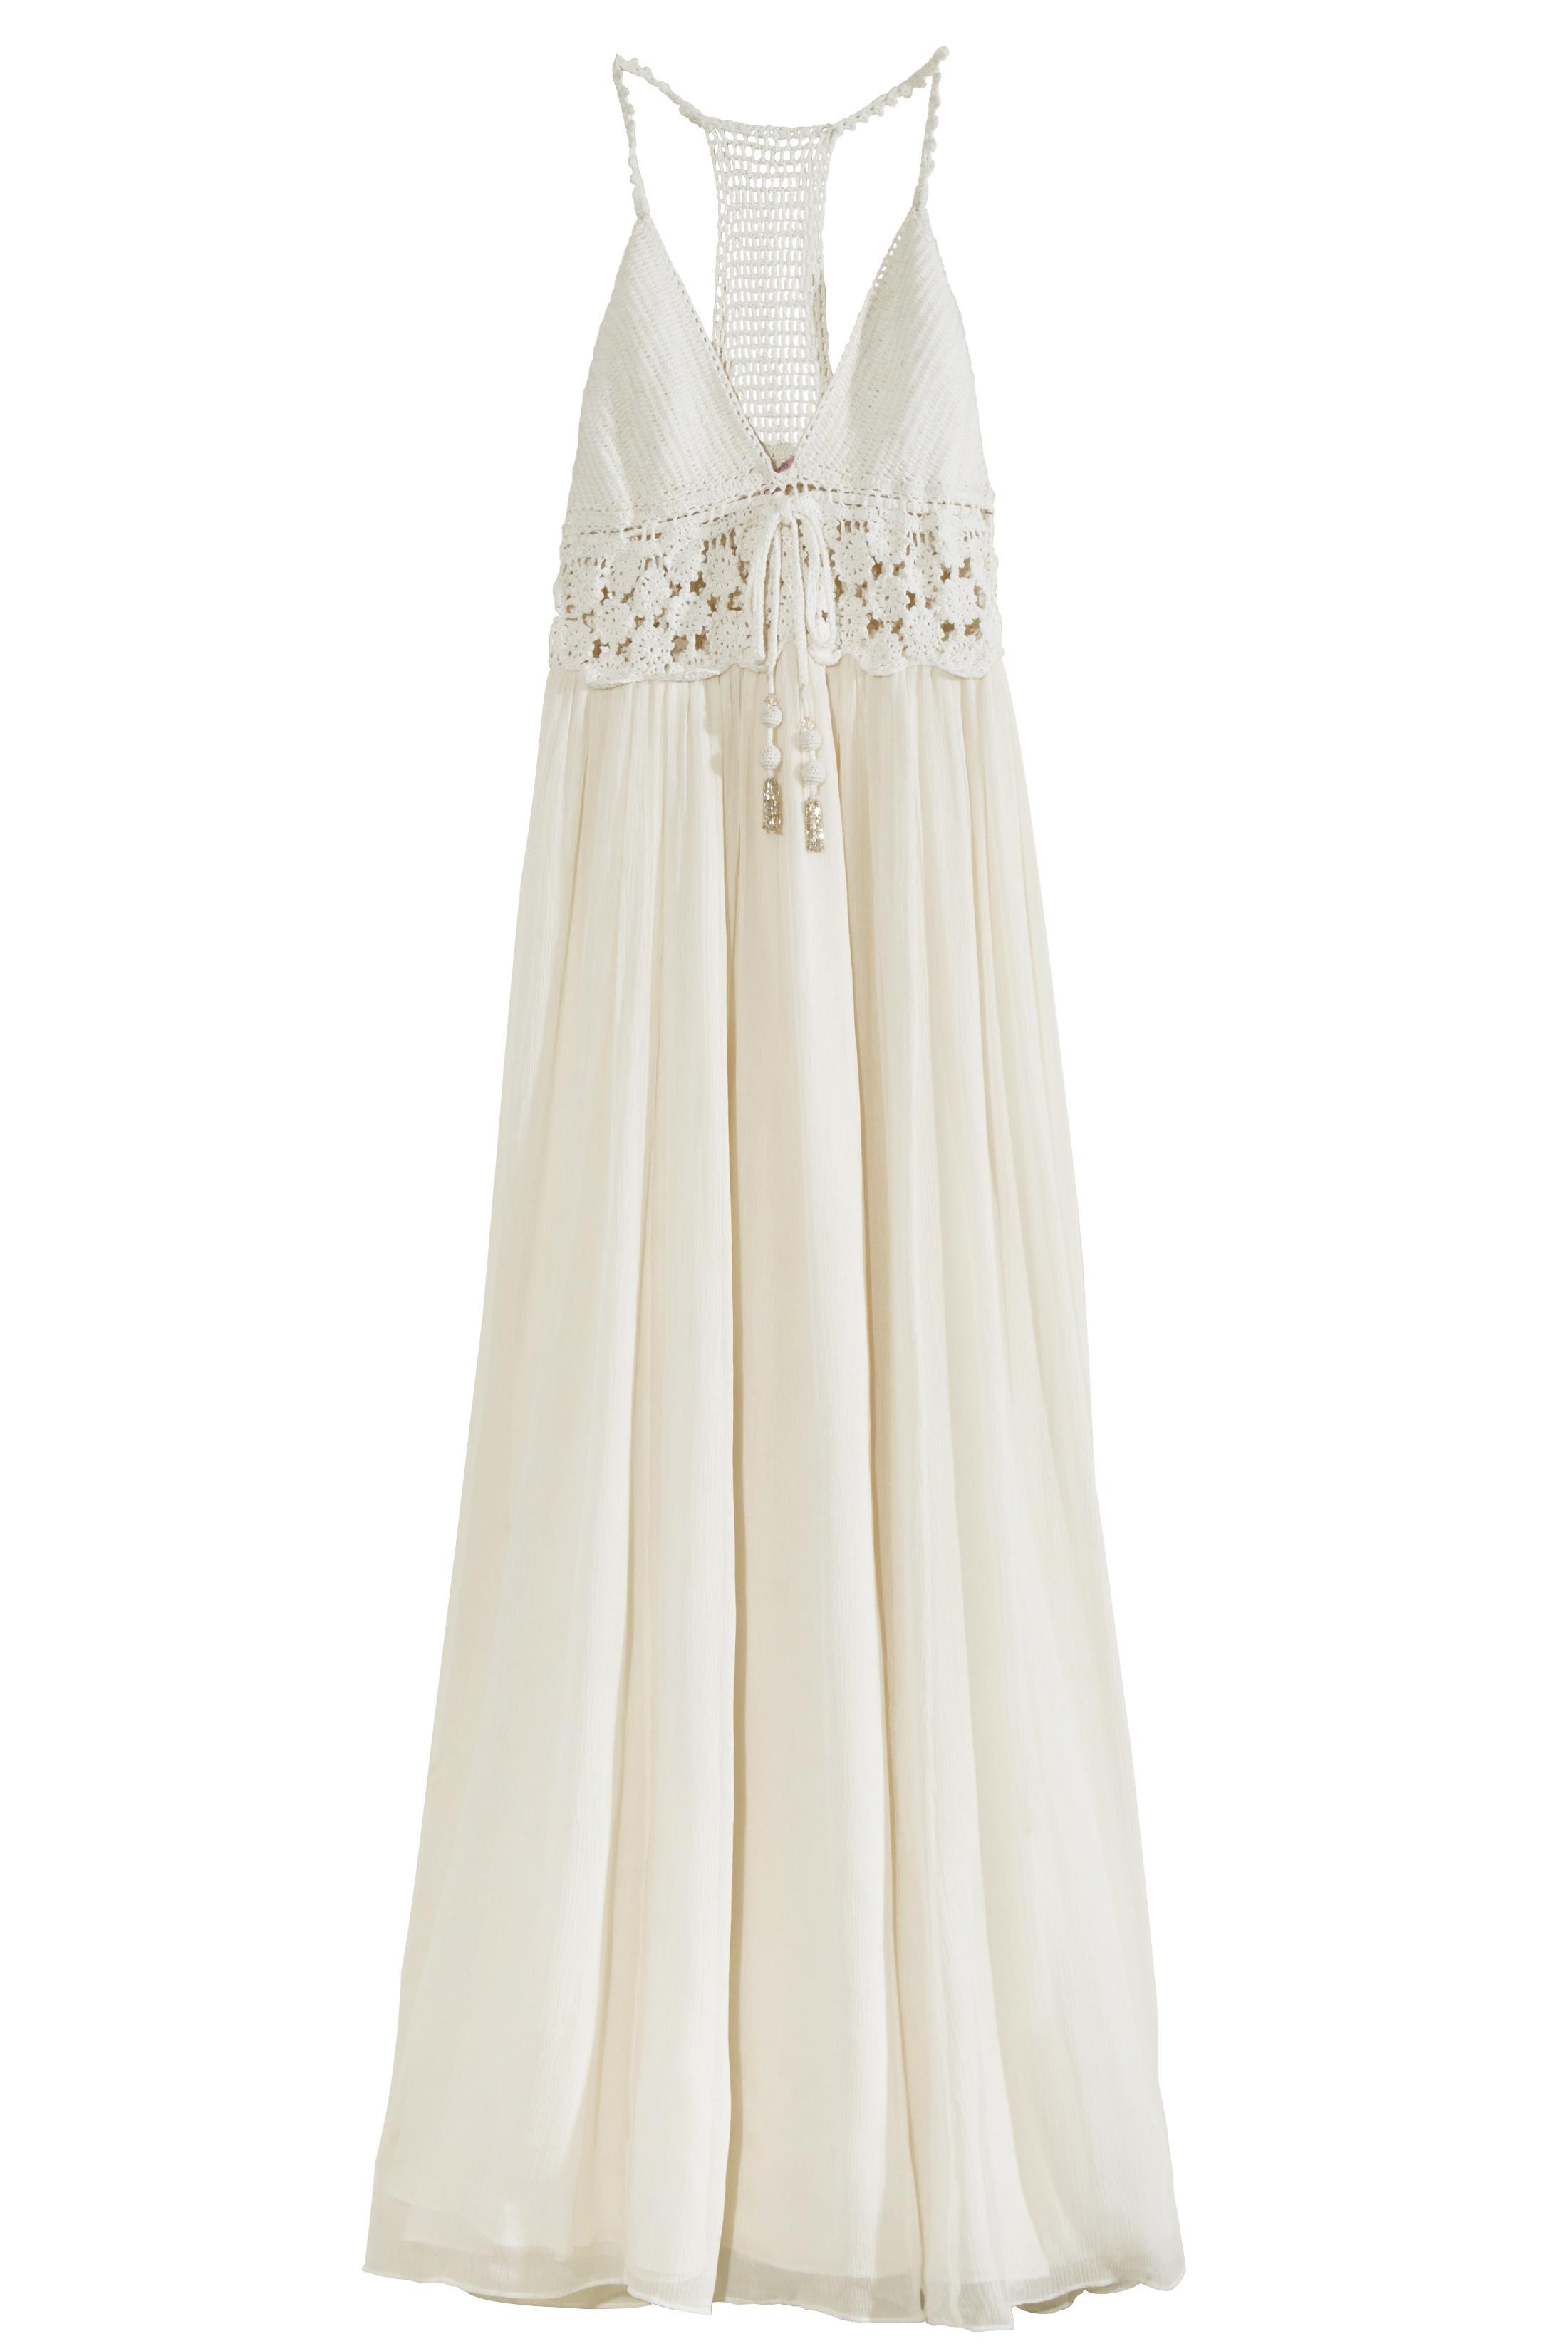 calypso-st-barth-bridal-sasina-dress-0315.jpg